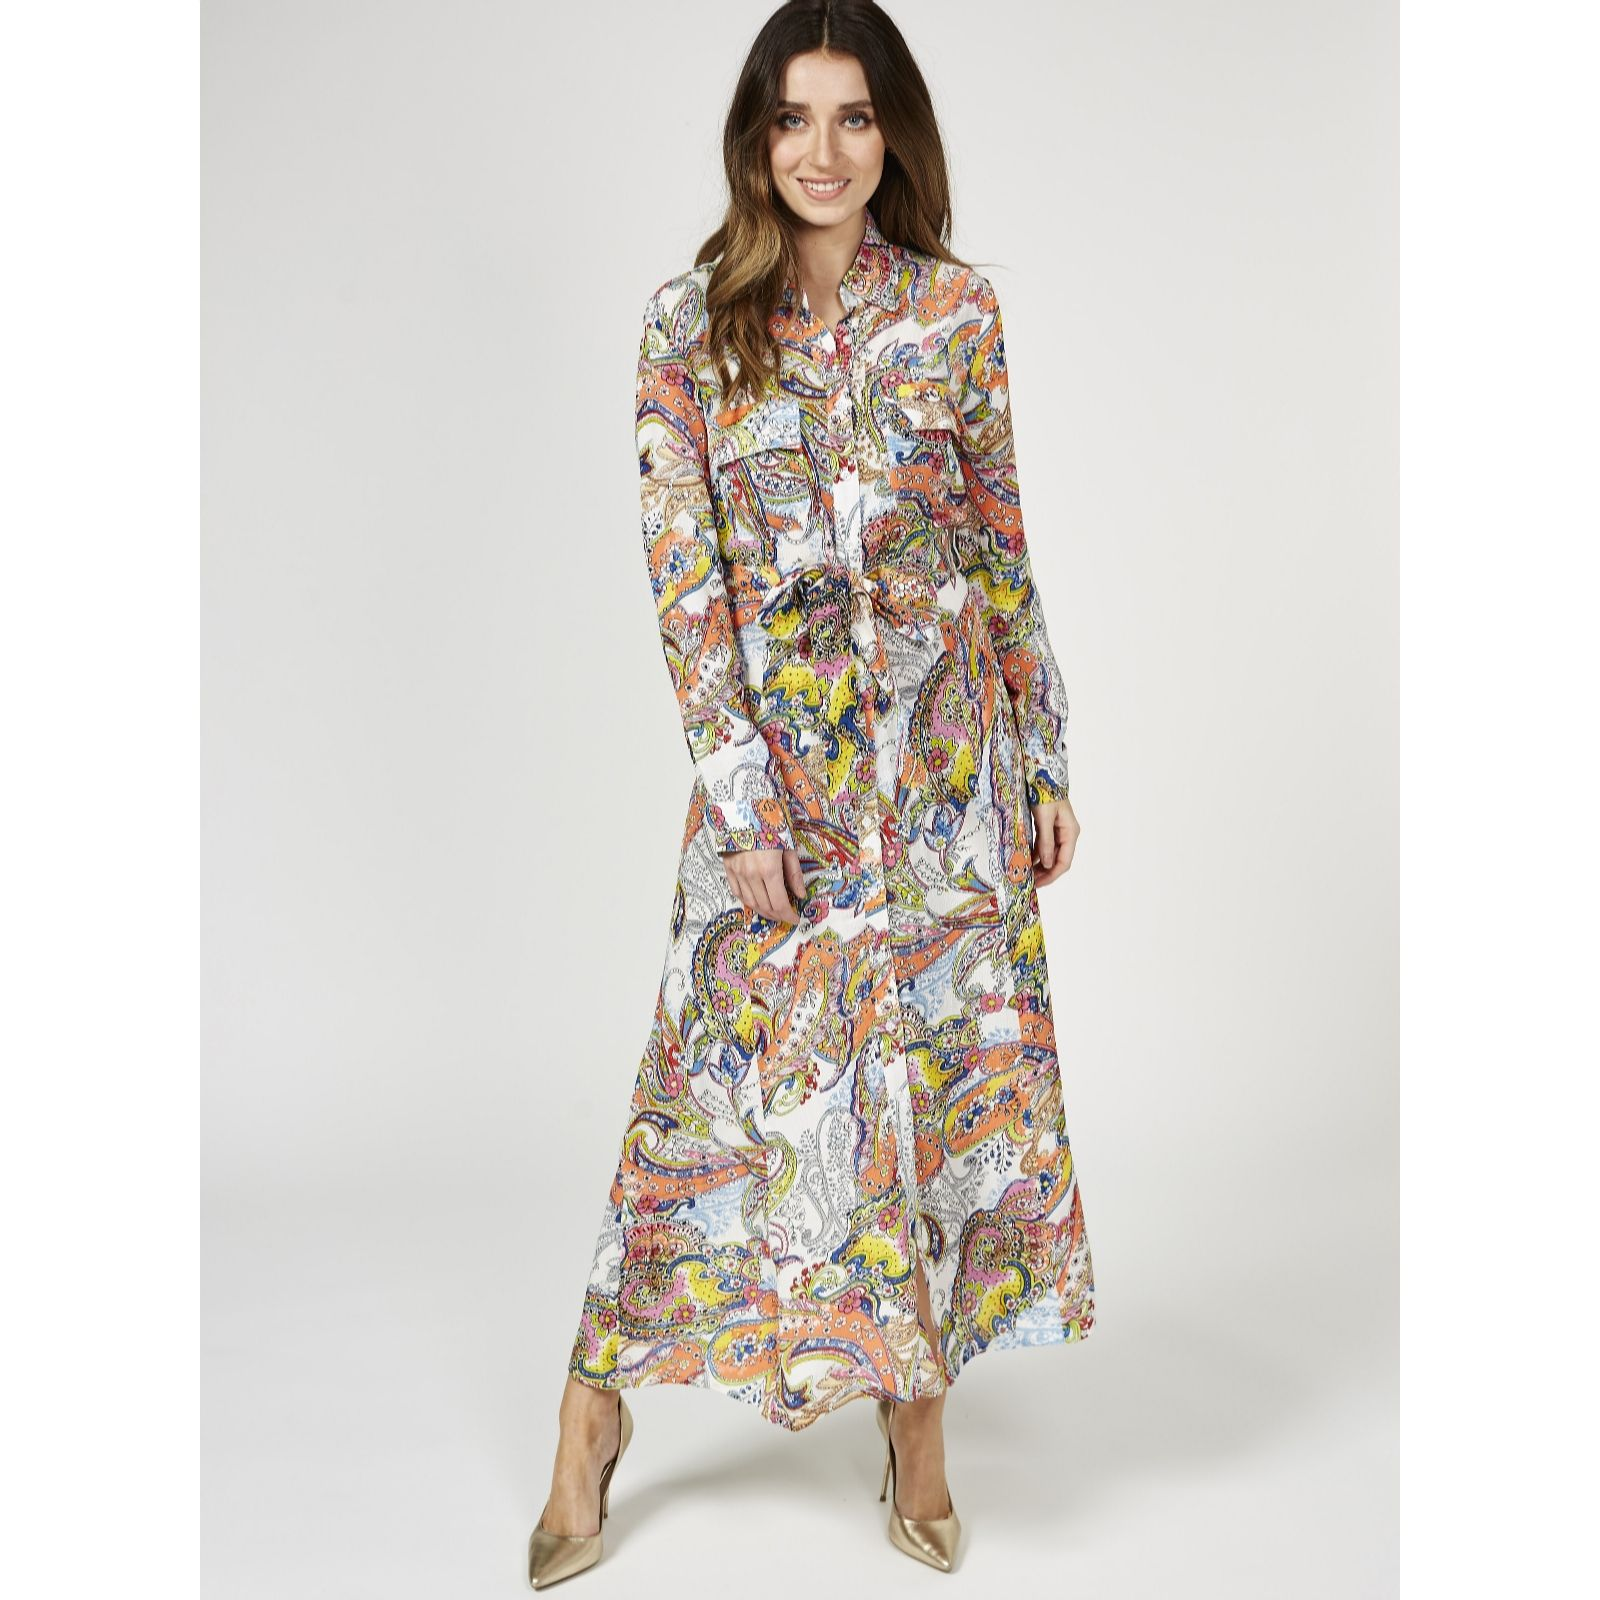 bd50d7316bbb Derhy Paisley Print Shirt Dress with Pocket Detail - QVC UK